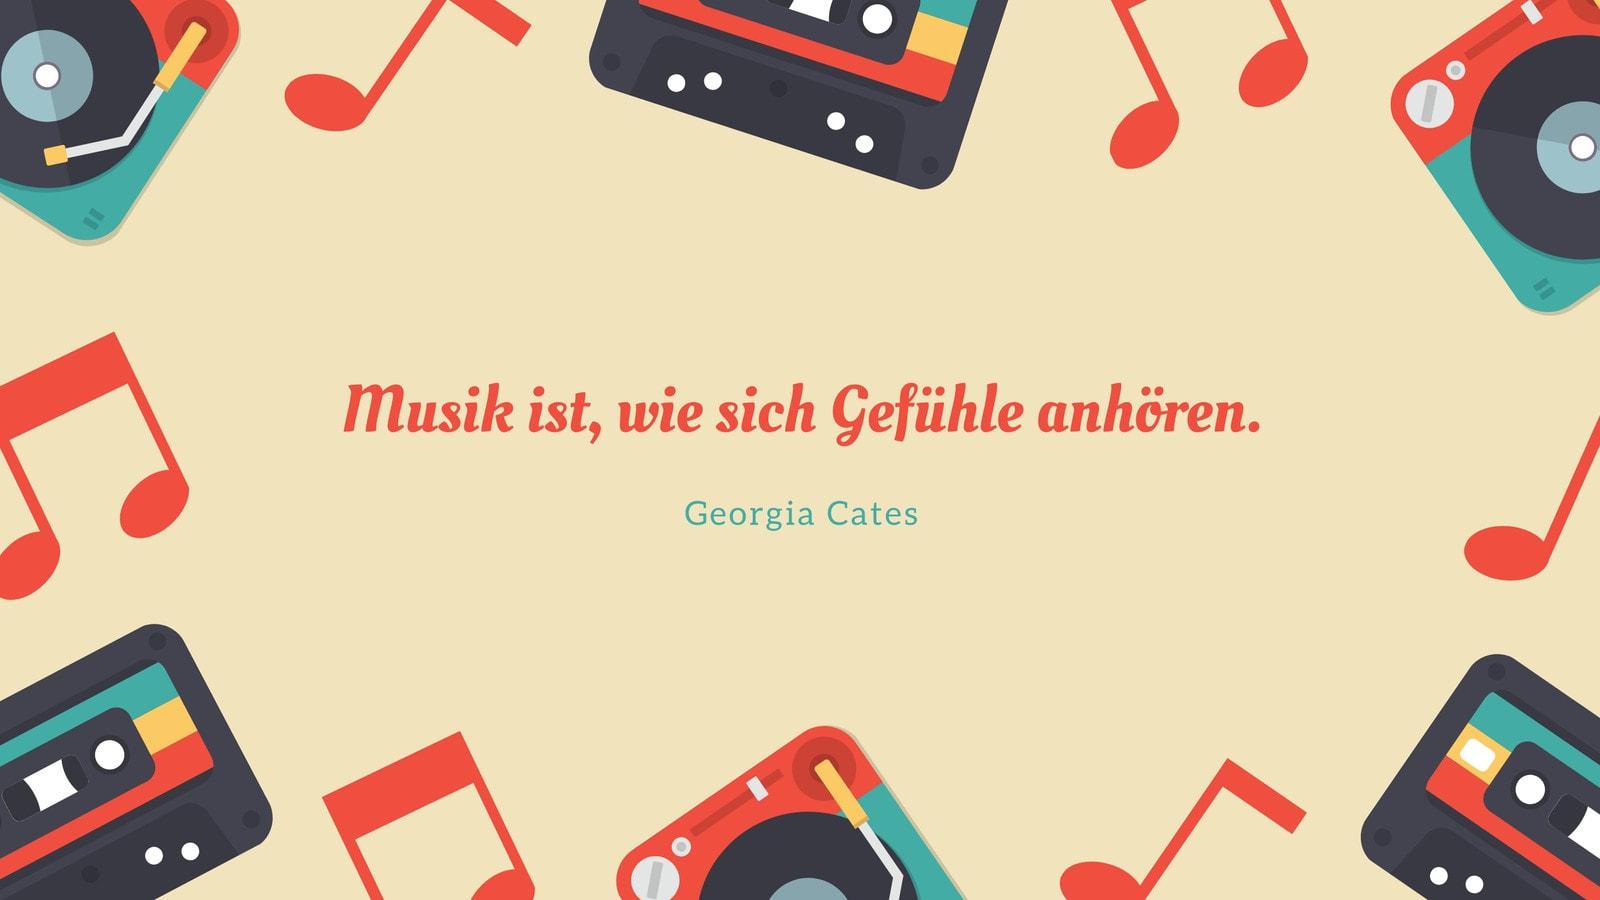 Bunt Musik Kassette Illustriert Retro Desktop Hintergrundbild